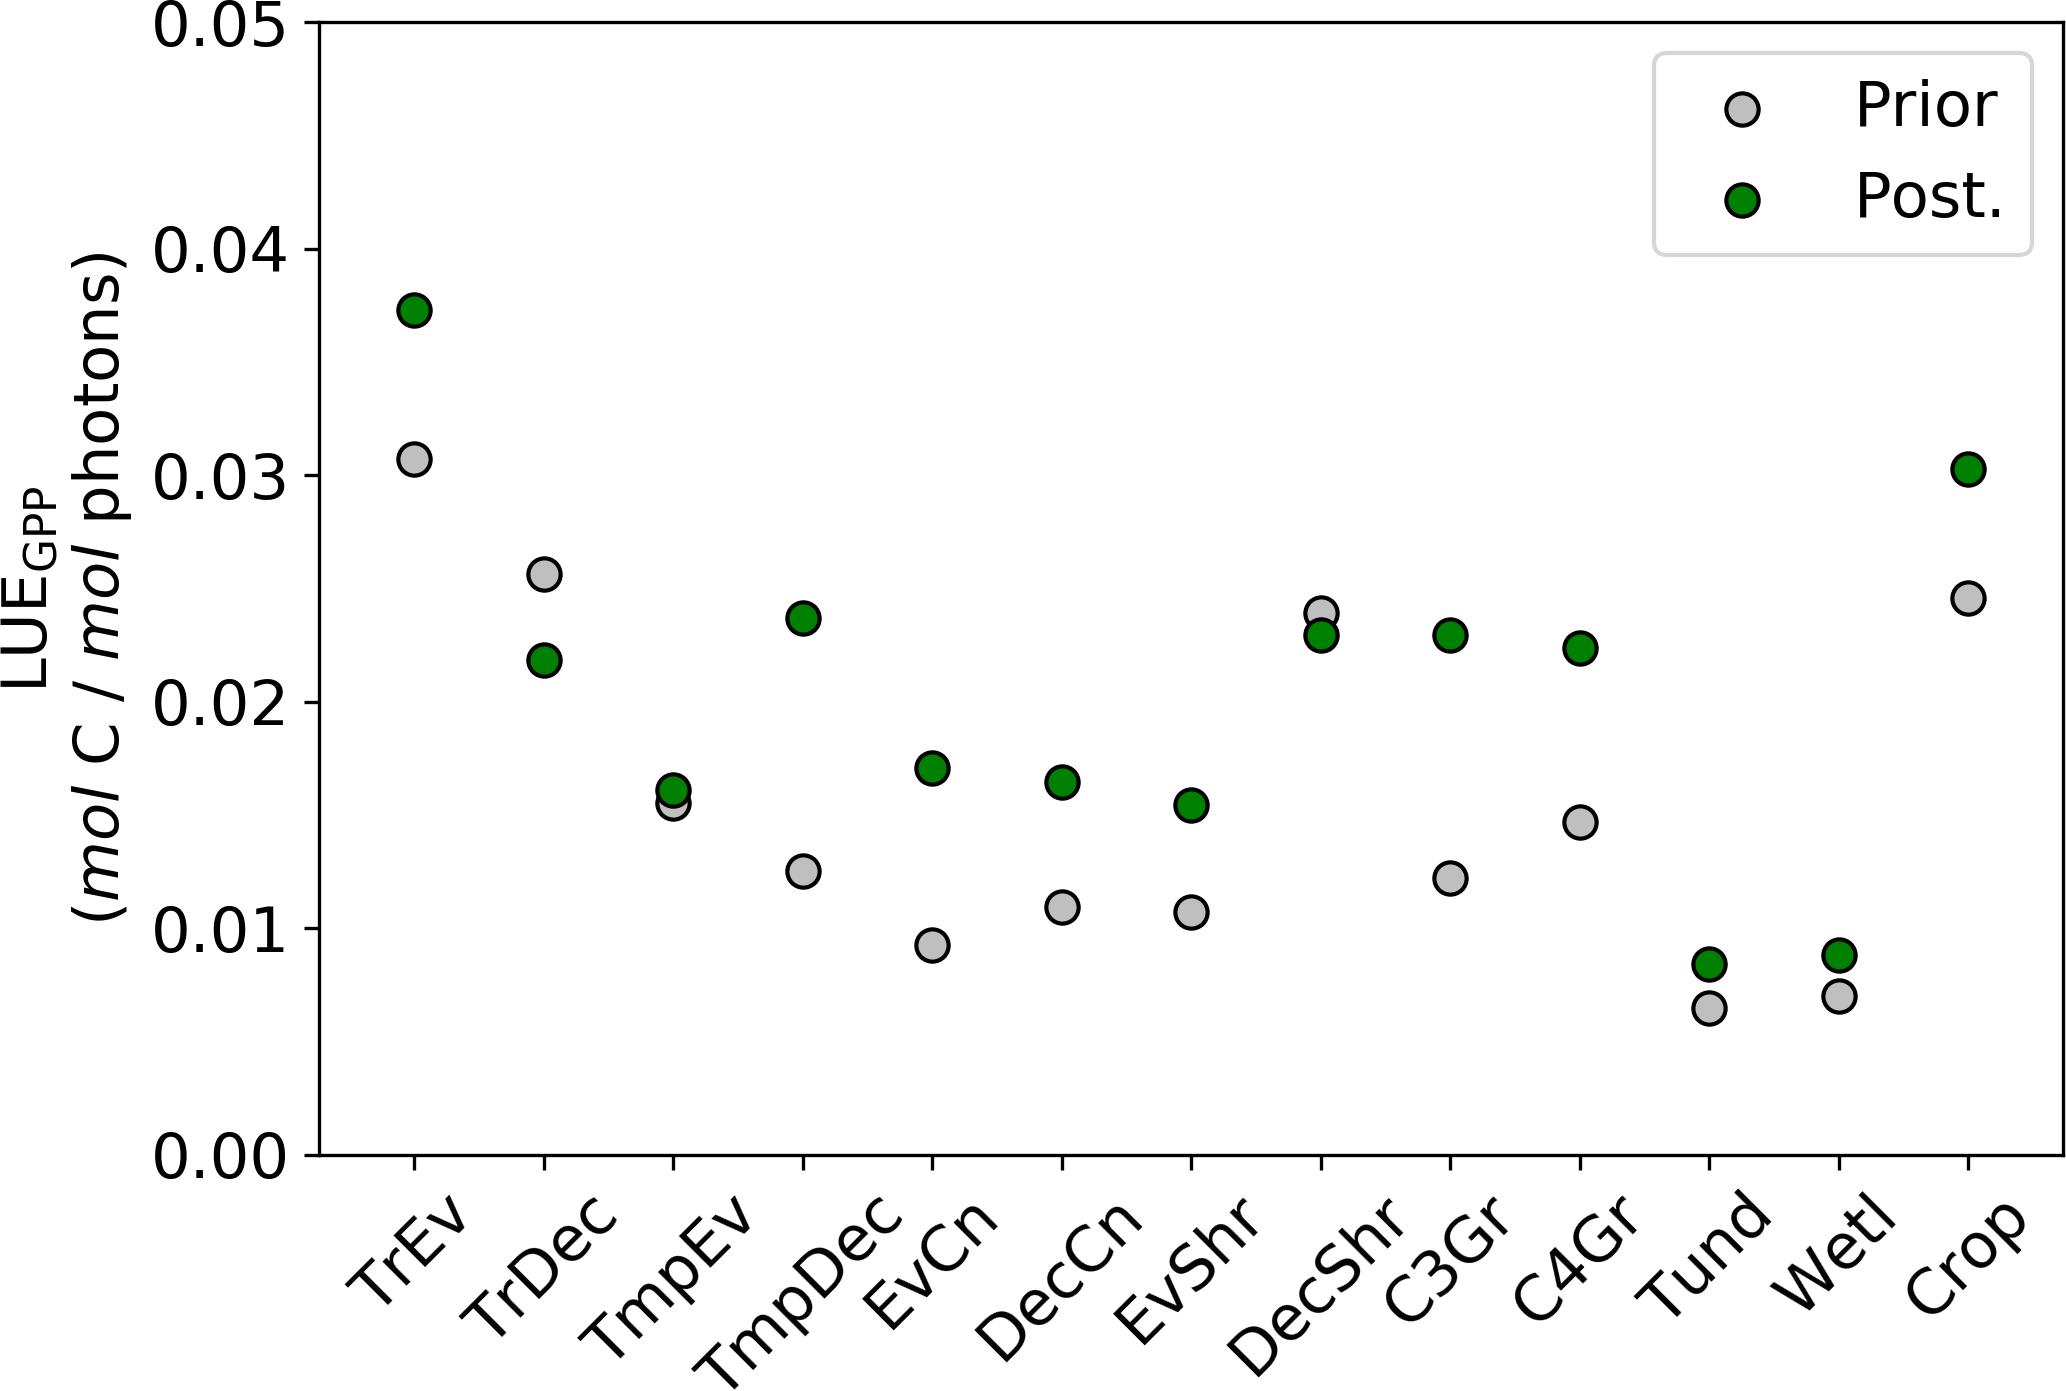 BG - Estimating global gross primary productivity using